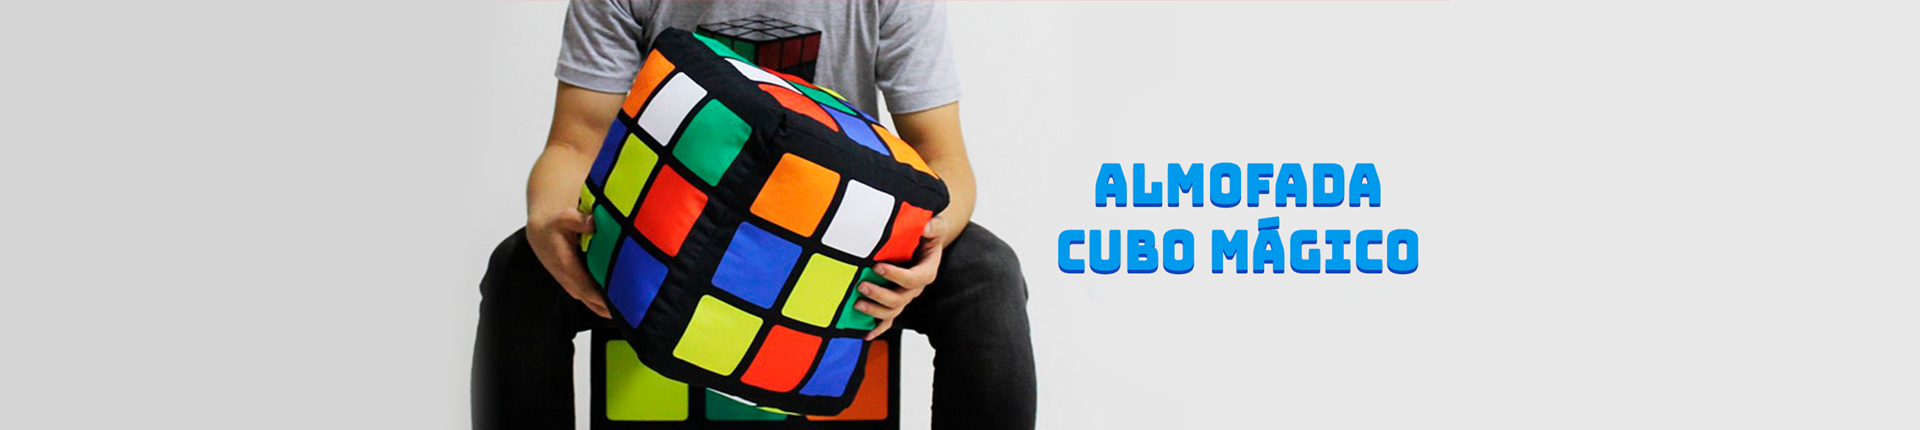 Almofada Cubo Mágico